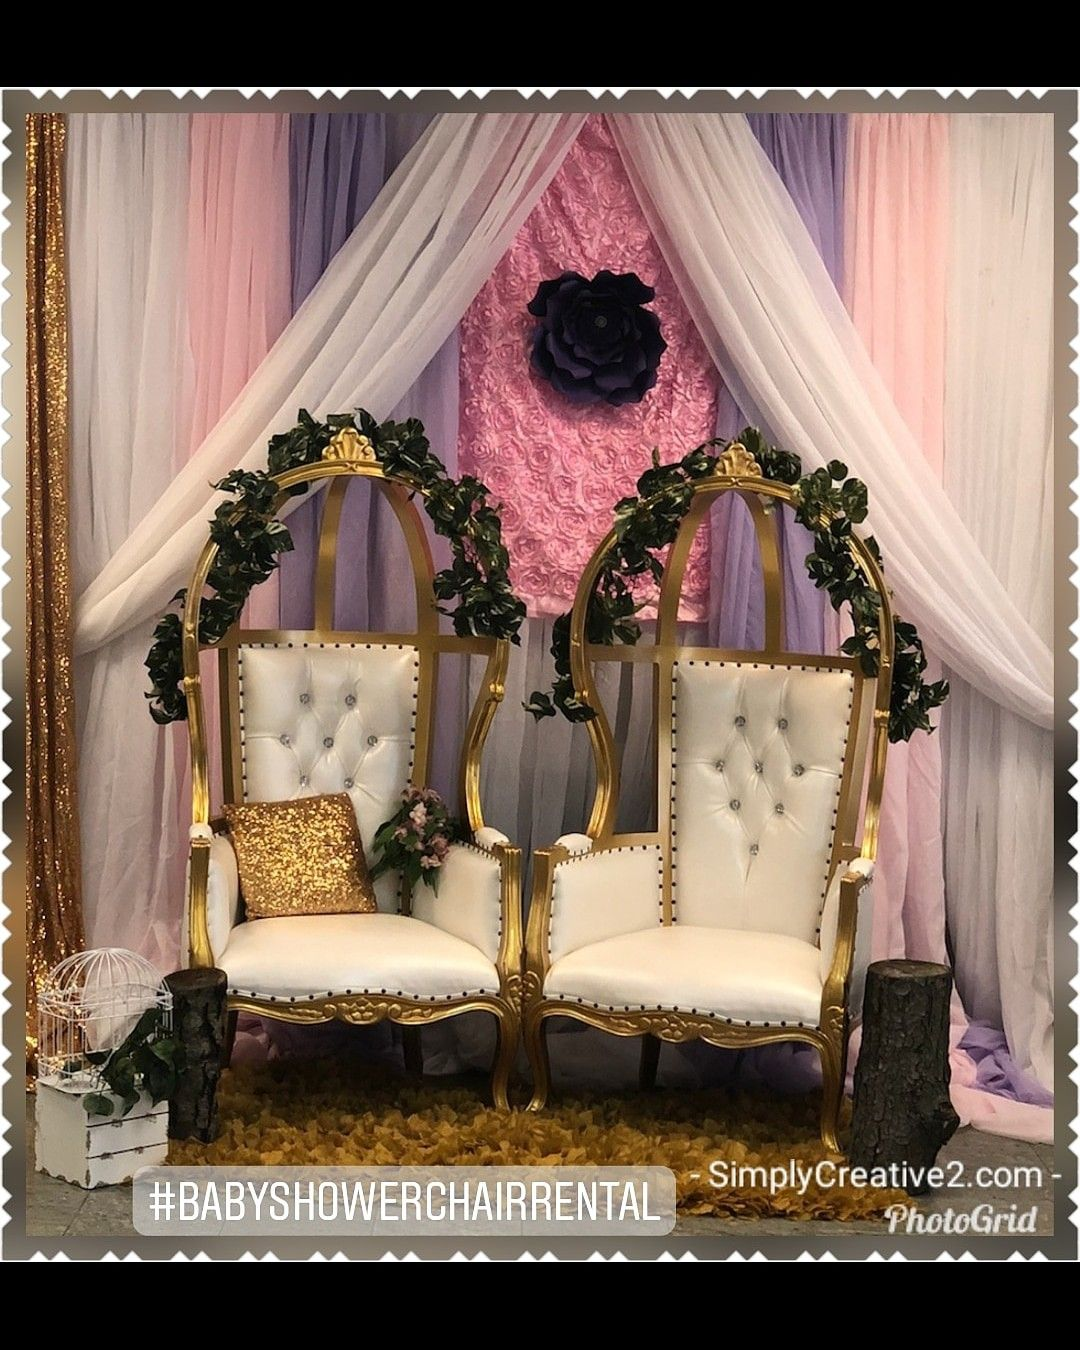 Park Art|My WordPress Blog_Royal Chair Rental For Baby Shower